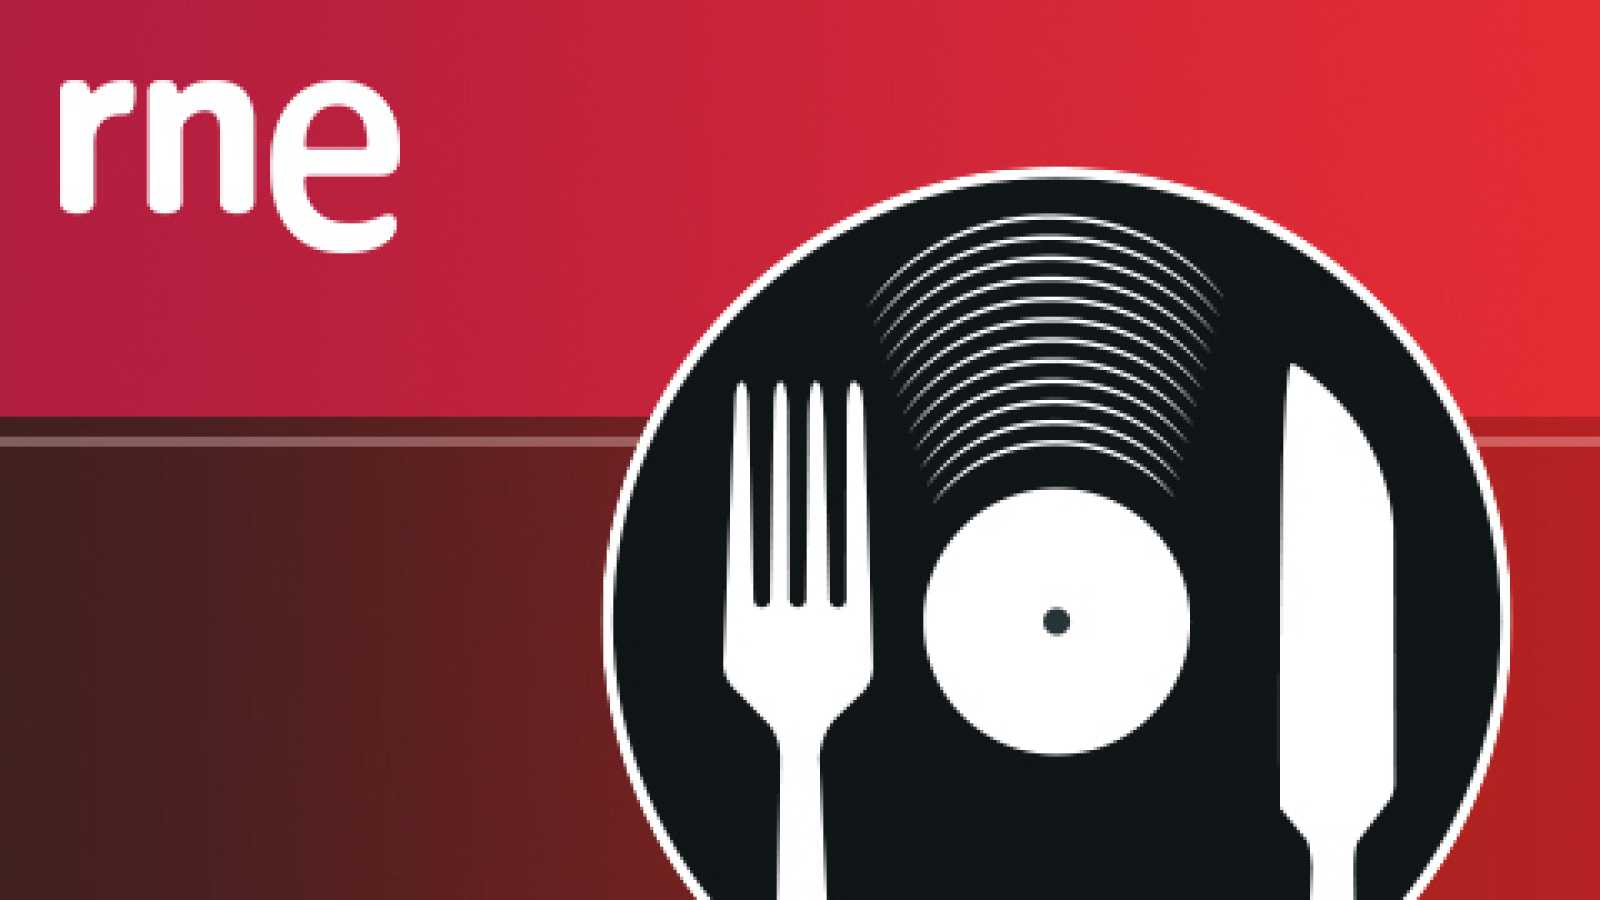 Comer y cantar - Hamburguesa gourmet a la crema de manzana - 17/05/14 -escuchar ahora